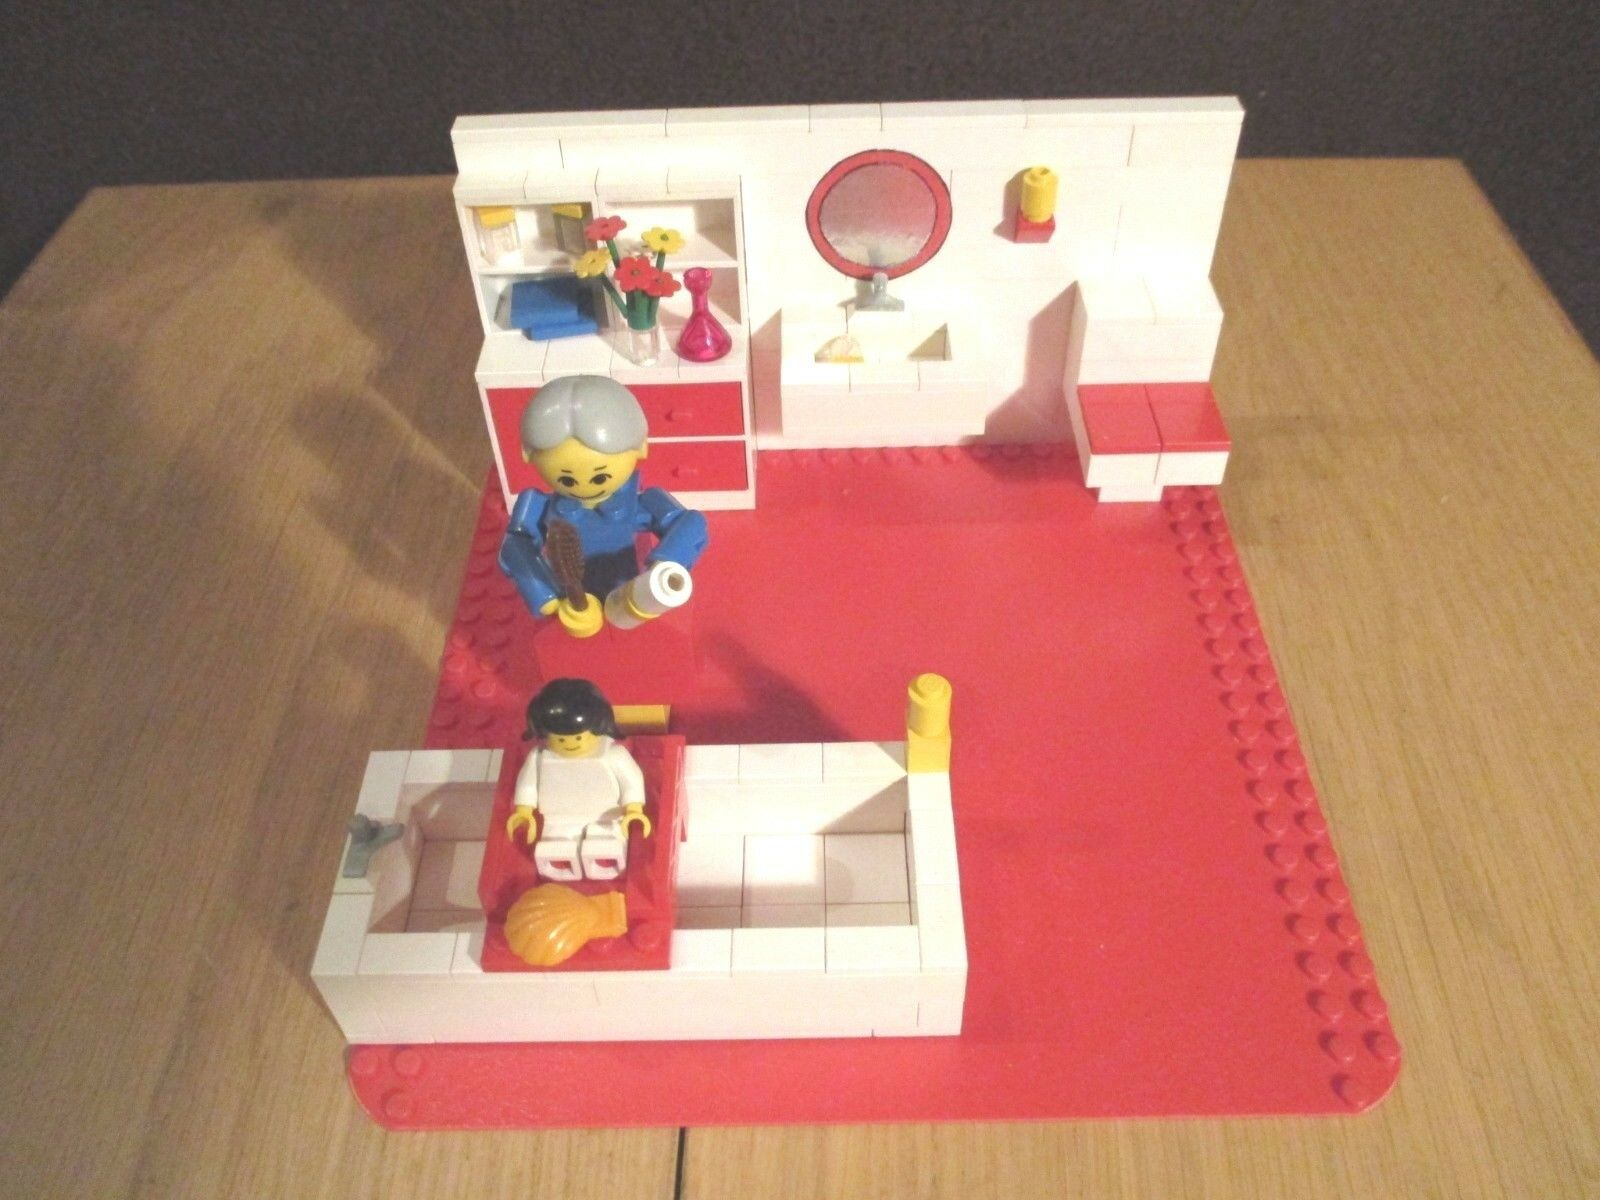 Lego - Homemaker - Badezimmer aus den 70 er Jahren